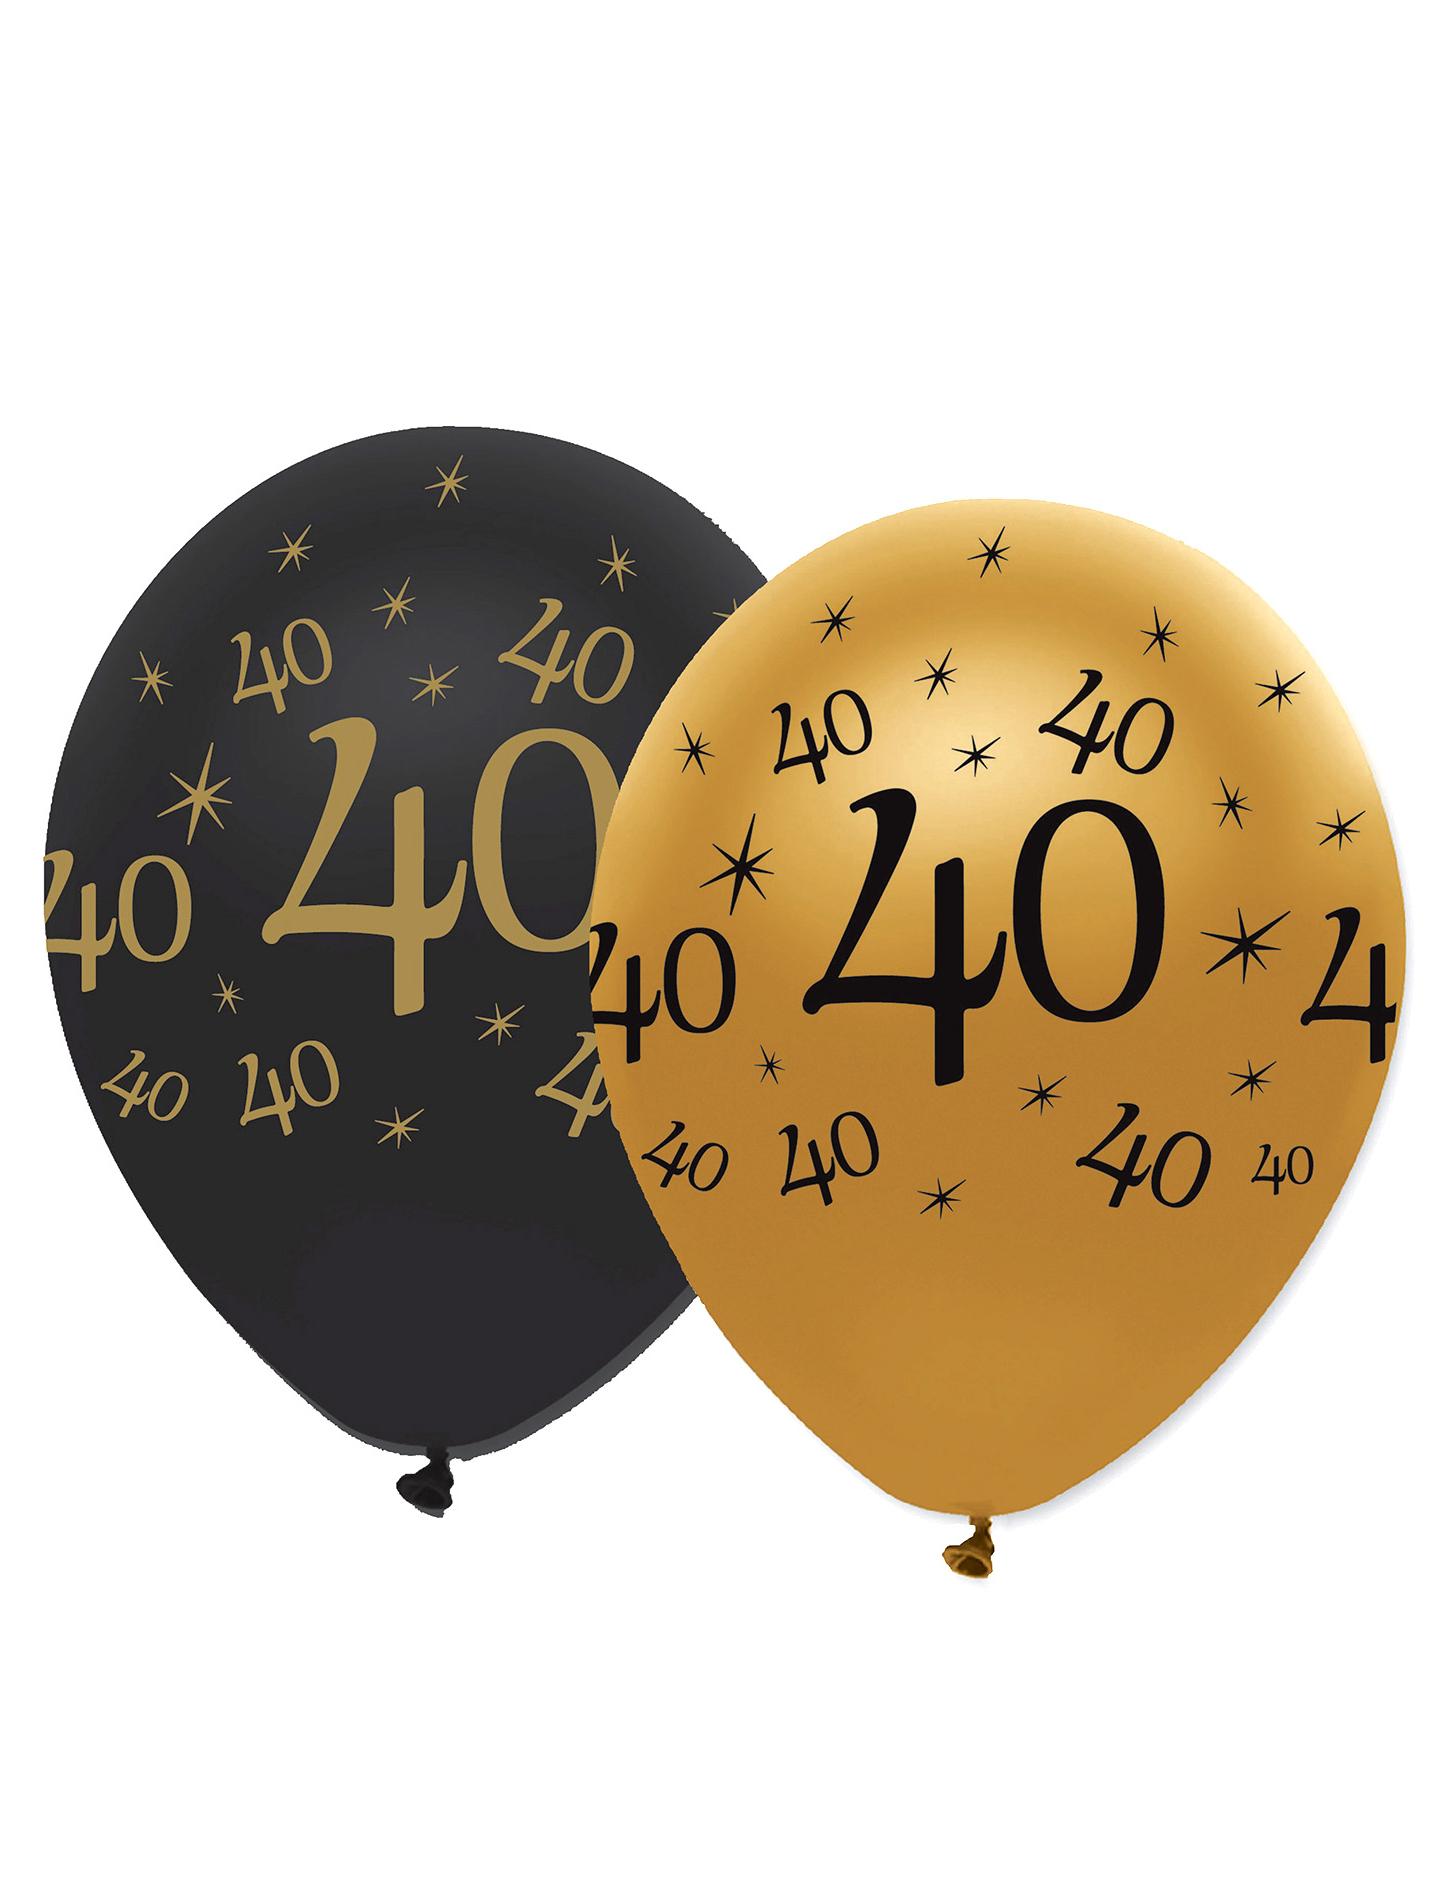 Geburtstagsballons 40 Jahre Jubiläums Luftballons 6 Stück Gold